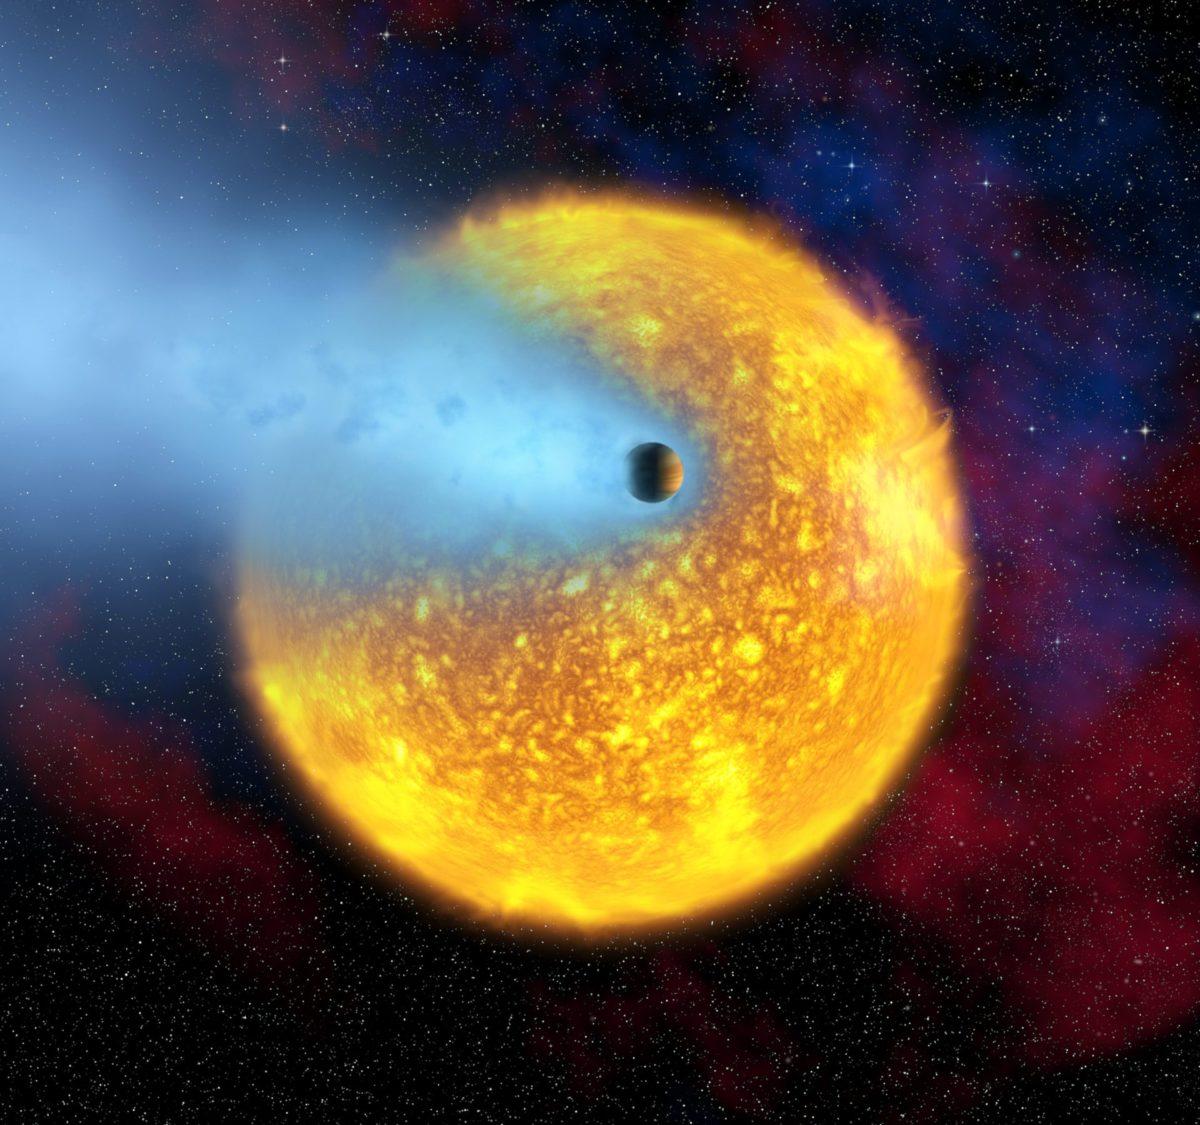 planetas raros o misteriosos